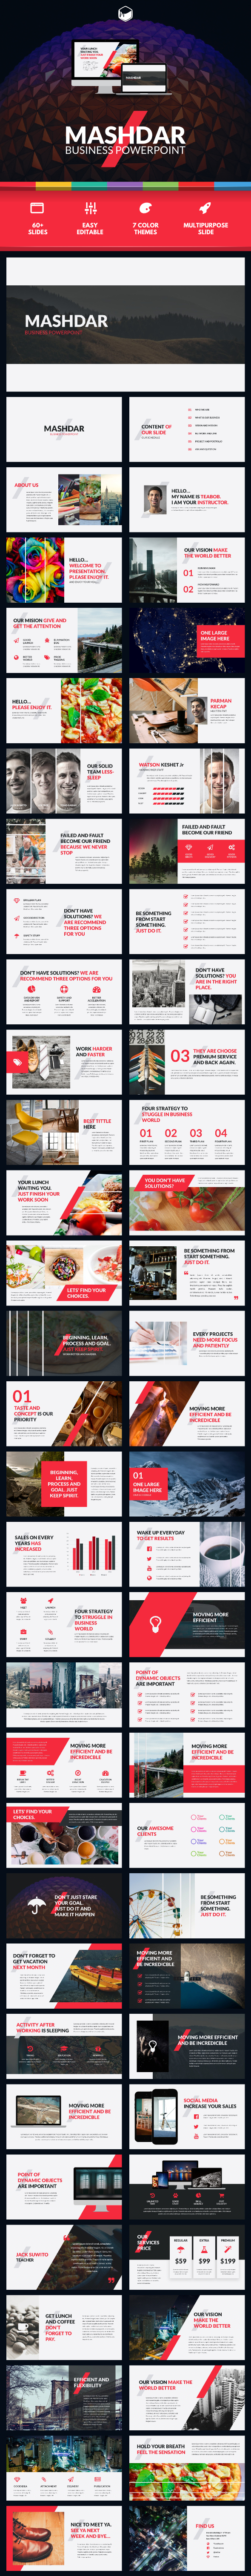 Mashdar - Business PowerPoint - Business PowerPoint Templates